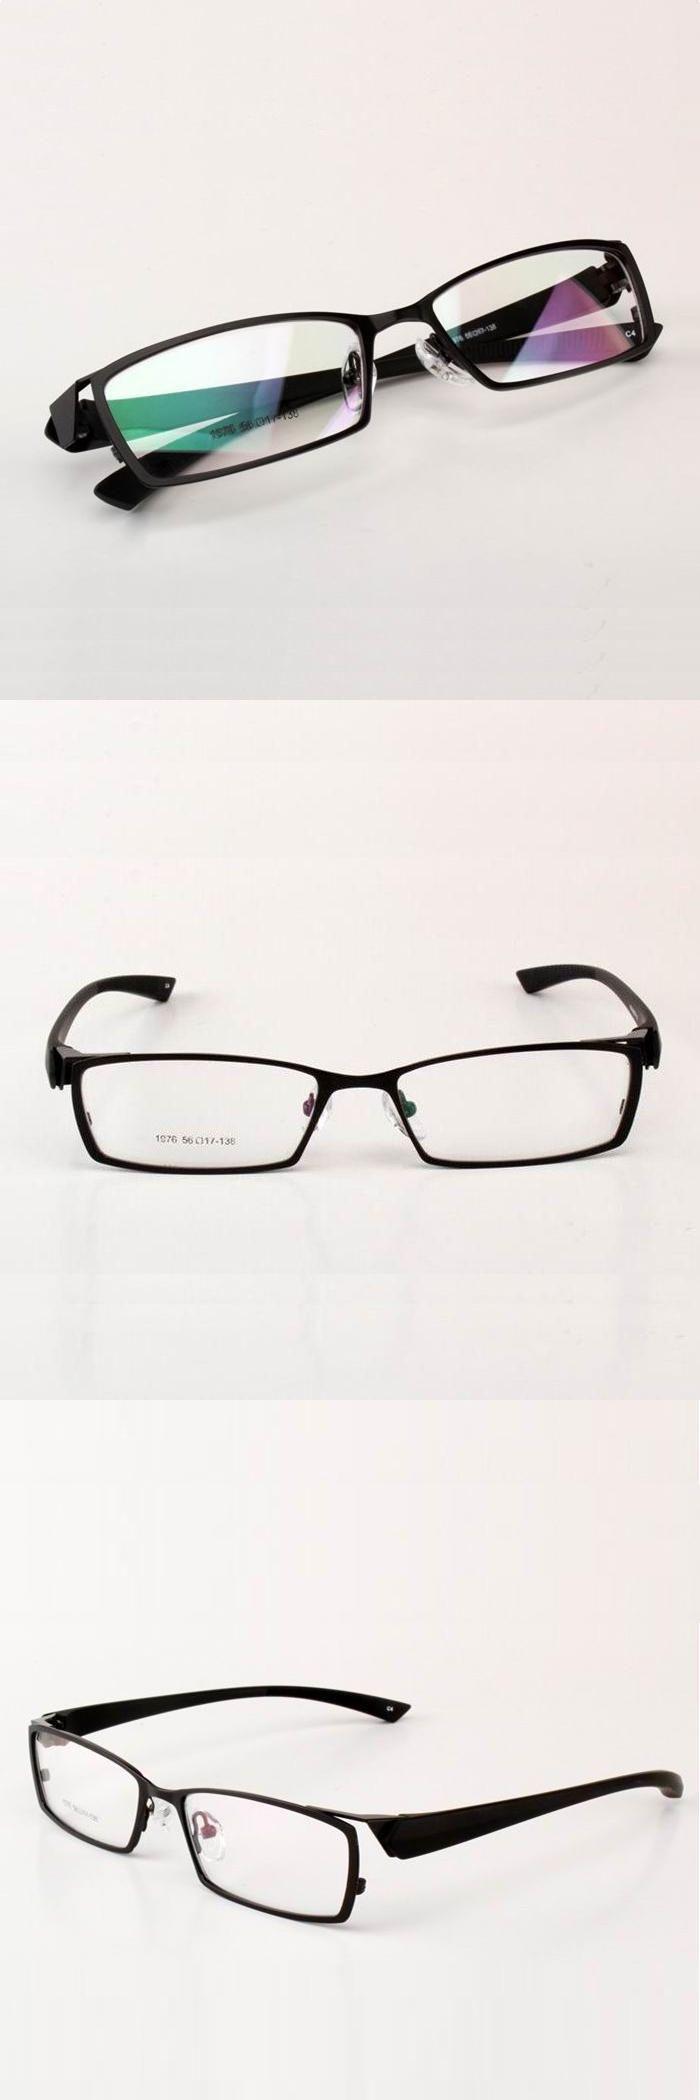 Occhiali da Vista Spy DWIGHT Matte Olive Brush jcElzsNmy